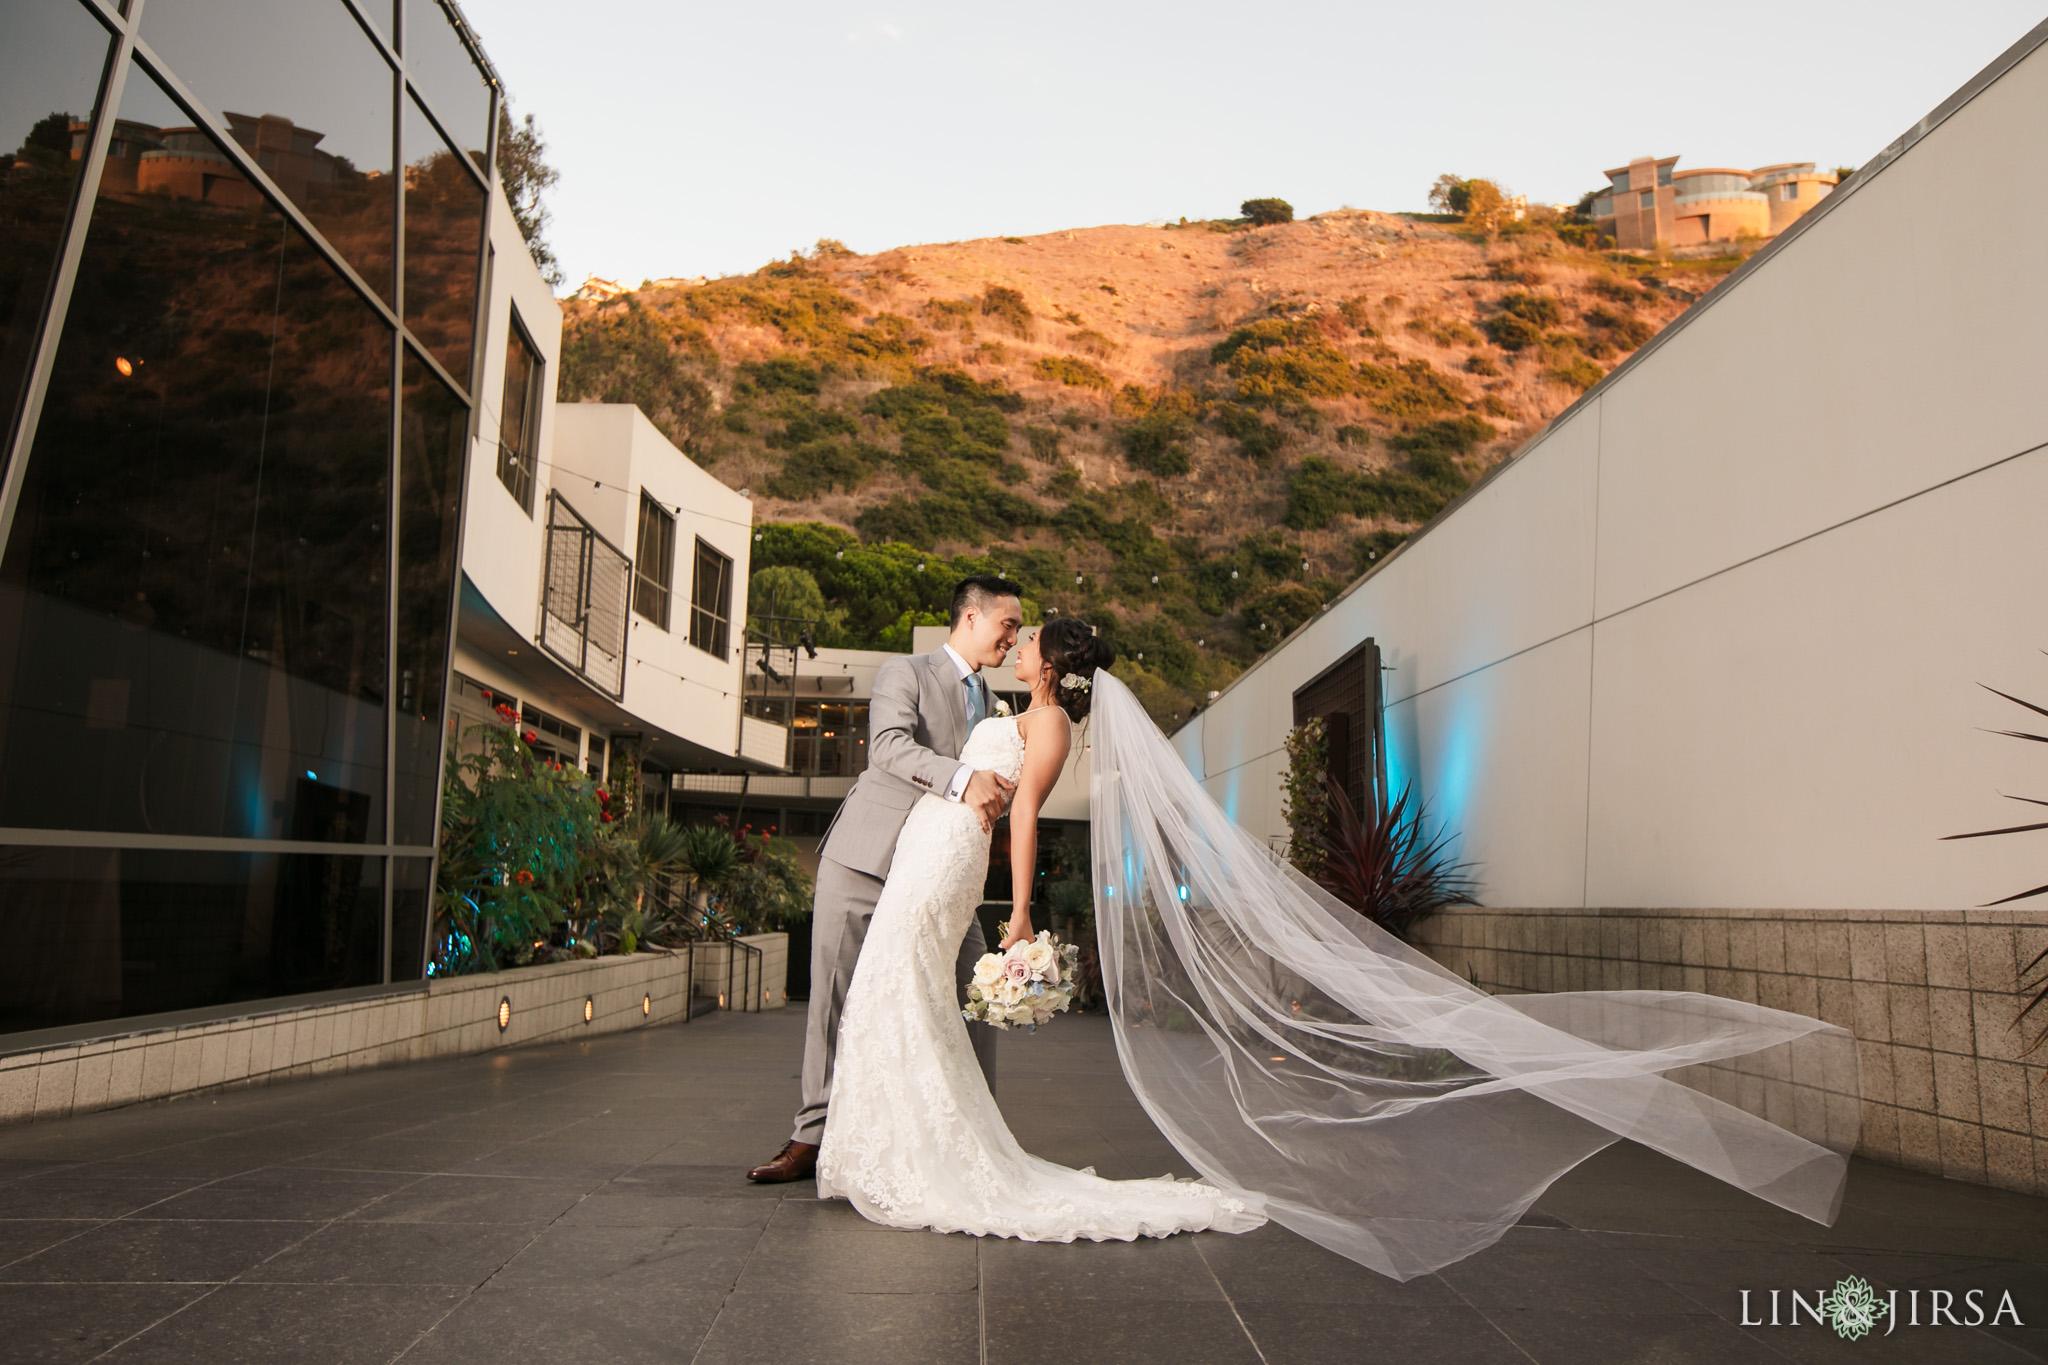 seven degrees wedding lin and jirsa photography